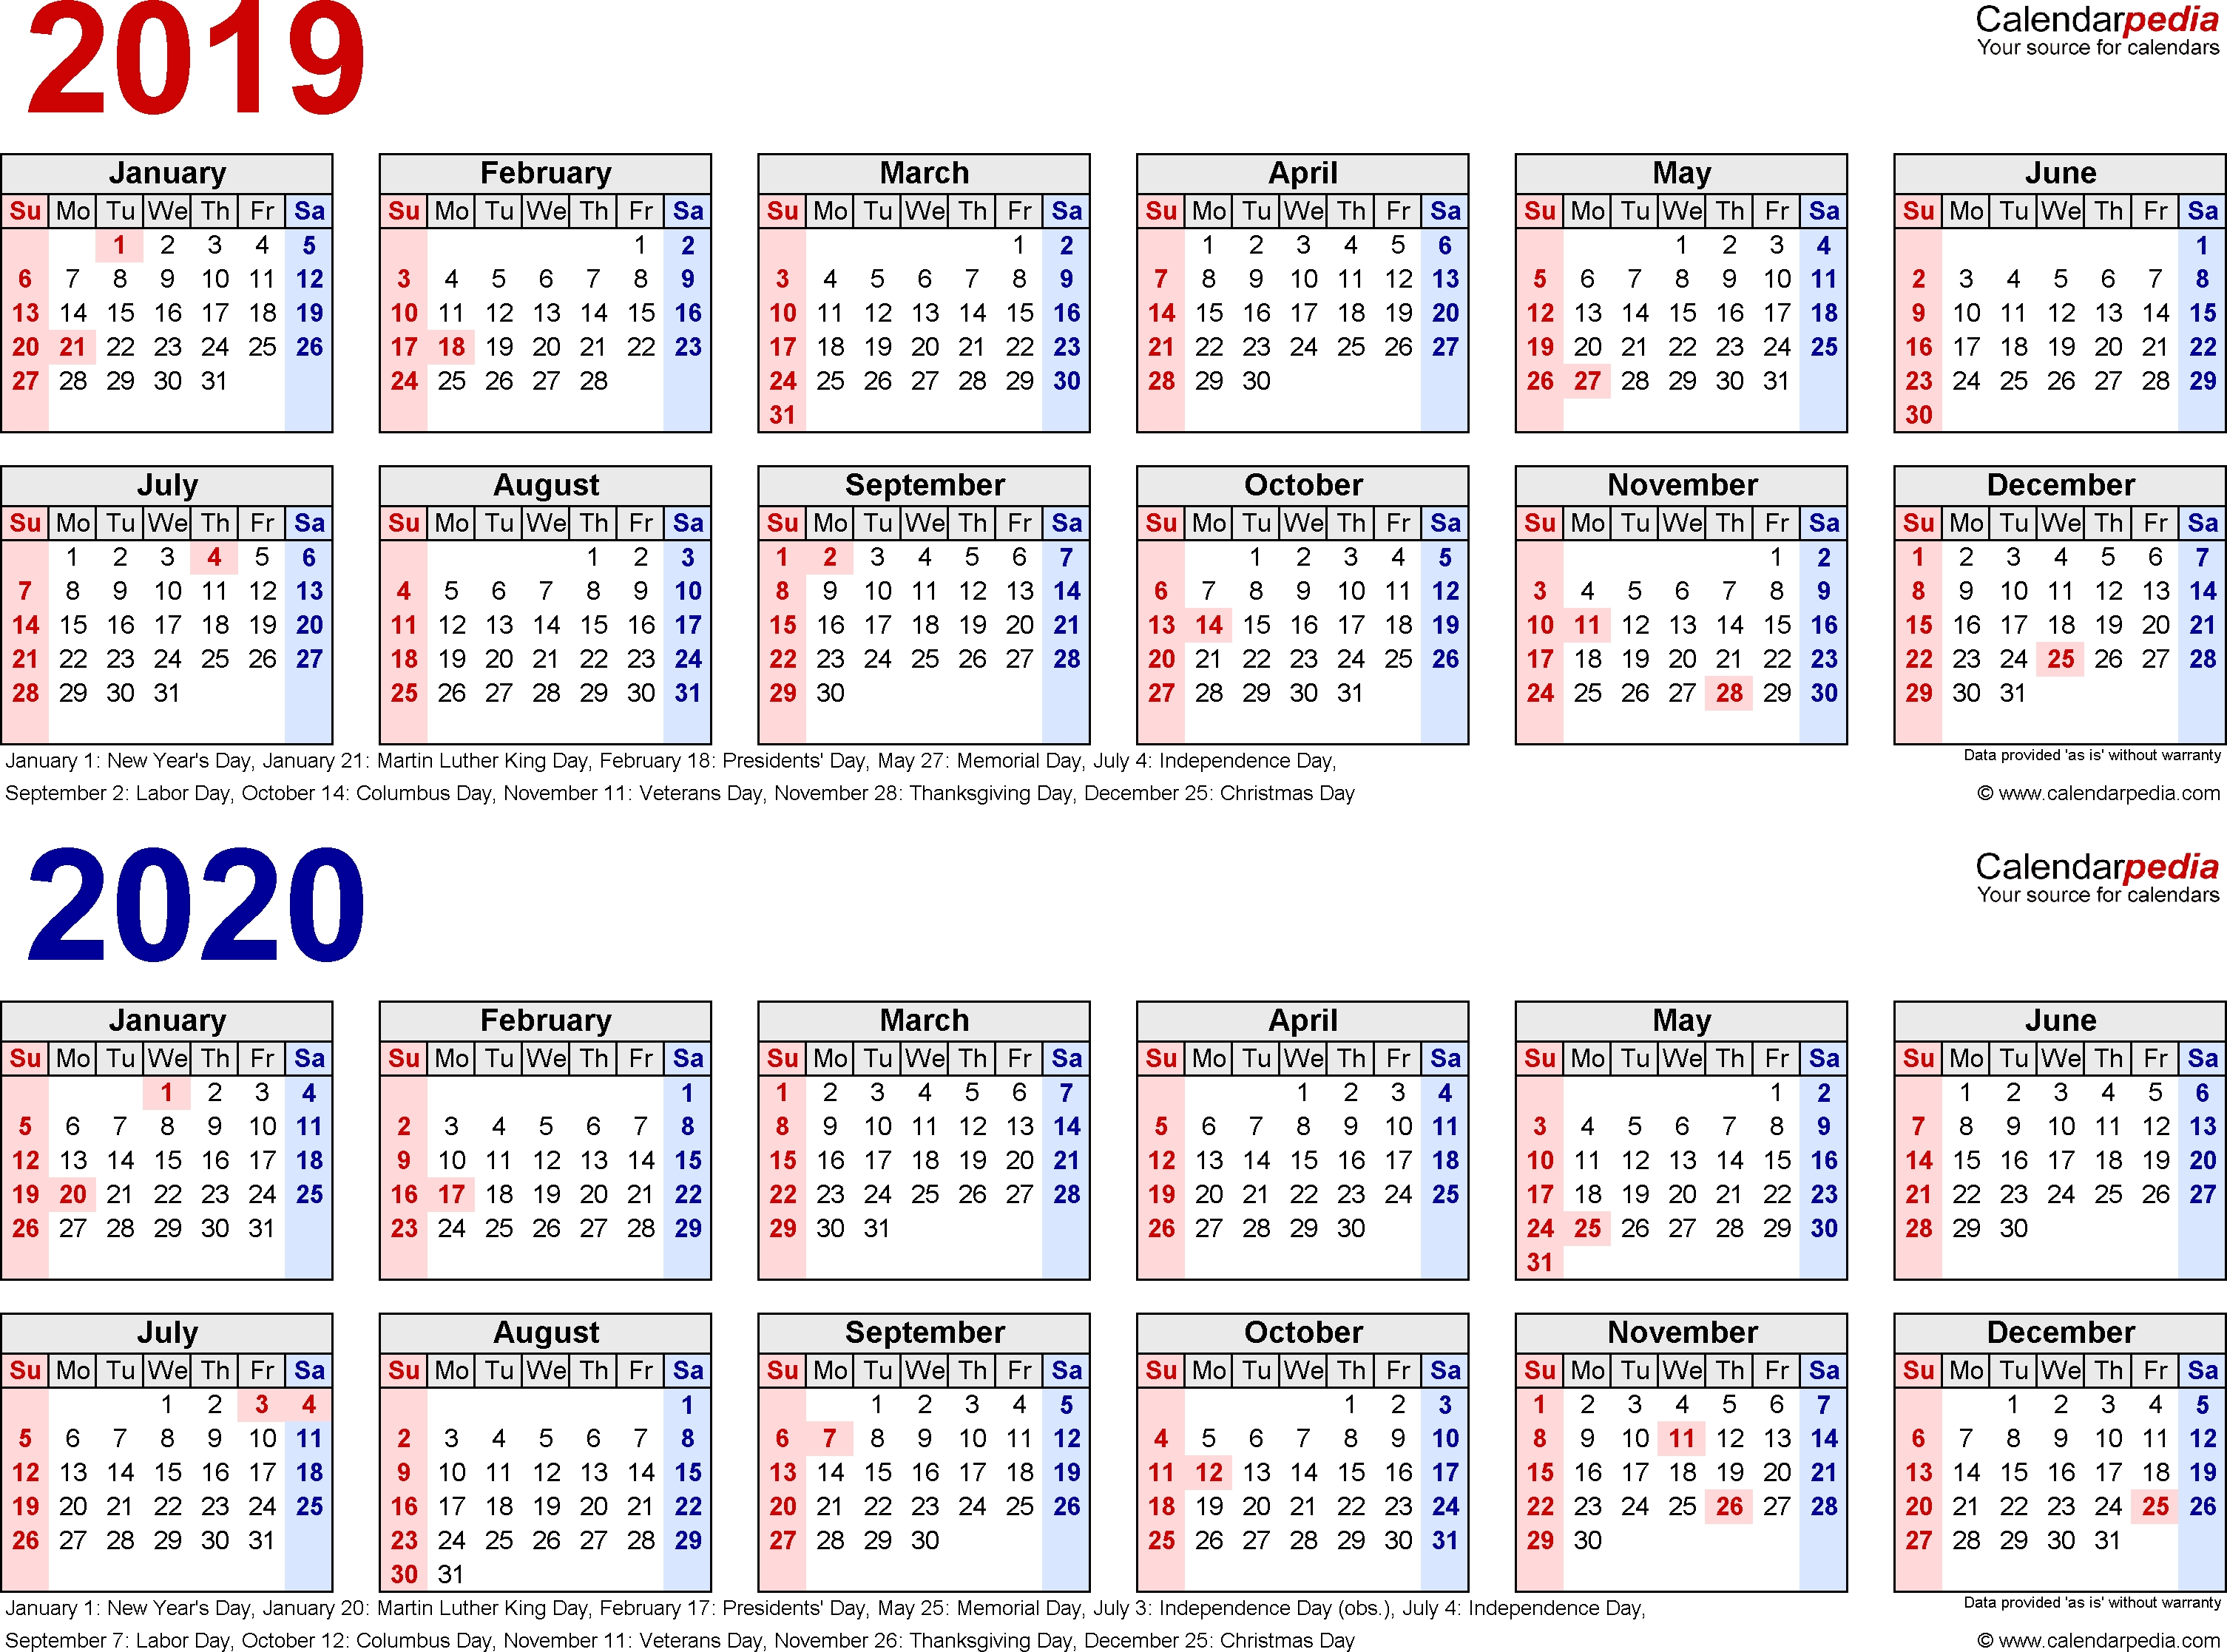 2019-2020 Calendar - Free Printable Two-Year Word Calendars with regard to 2019 2020 Calendar Fillabel Printable